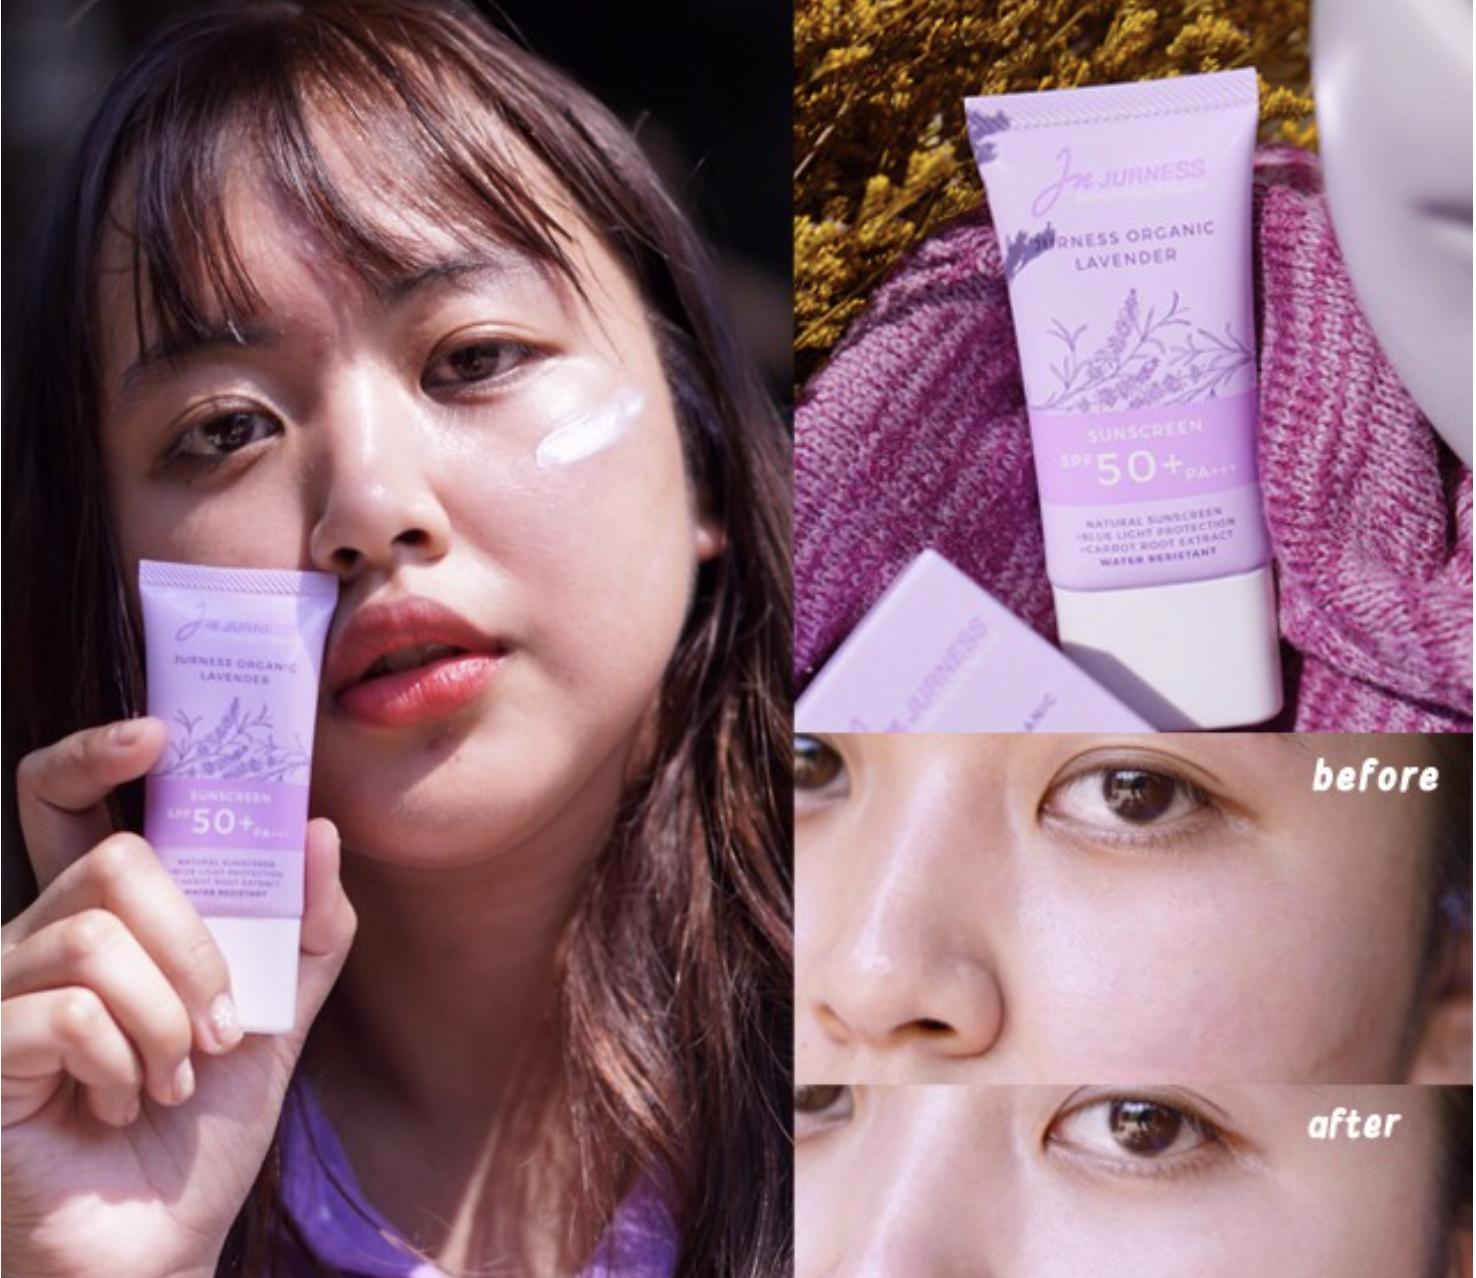 Review : JURNESS Organic Lavender Sunscreen SPF 50 PA+++ (SPF 67)